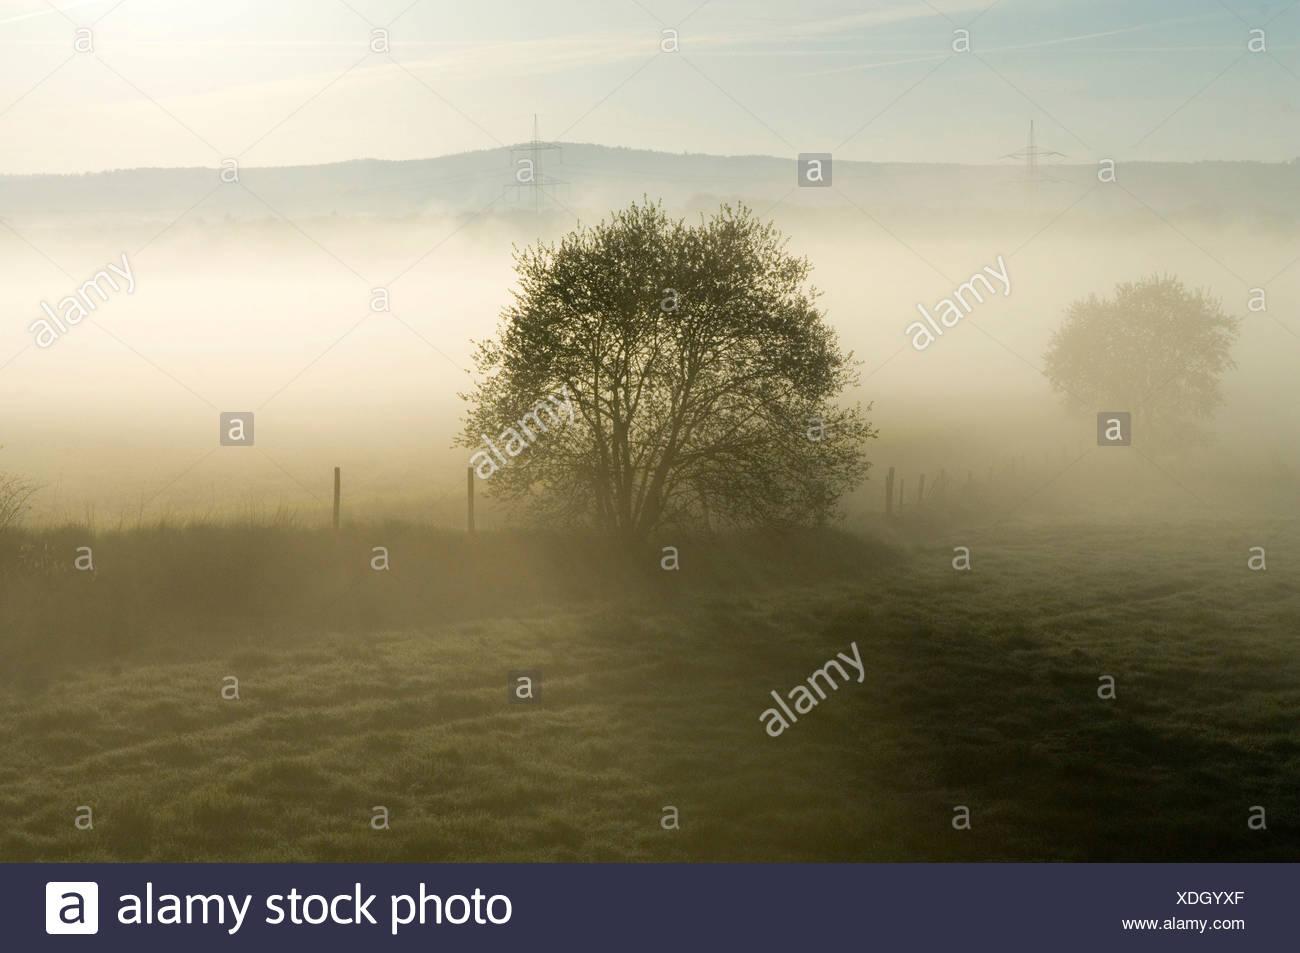 Early morning fog, Germany Stock Photo